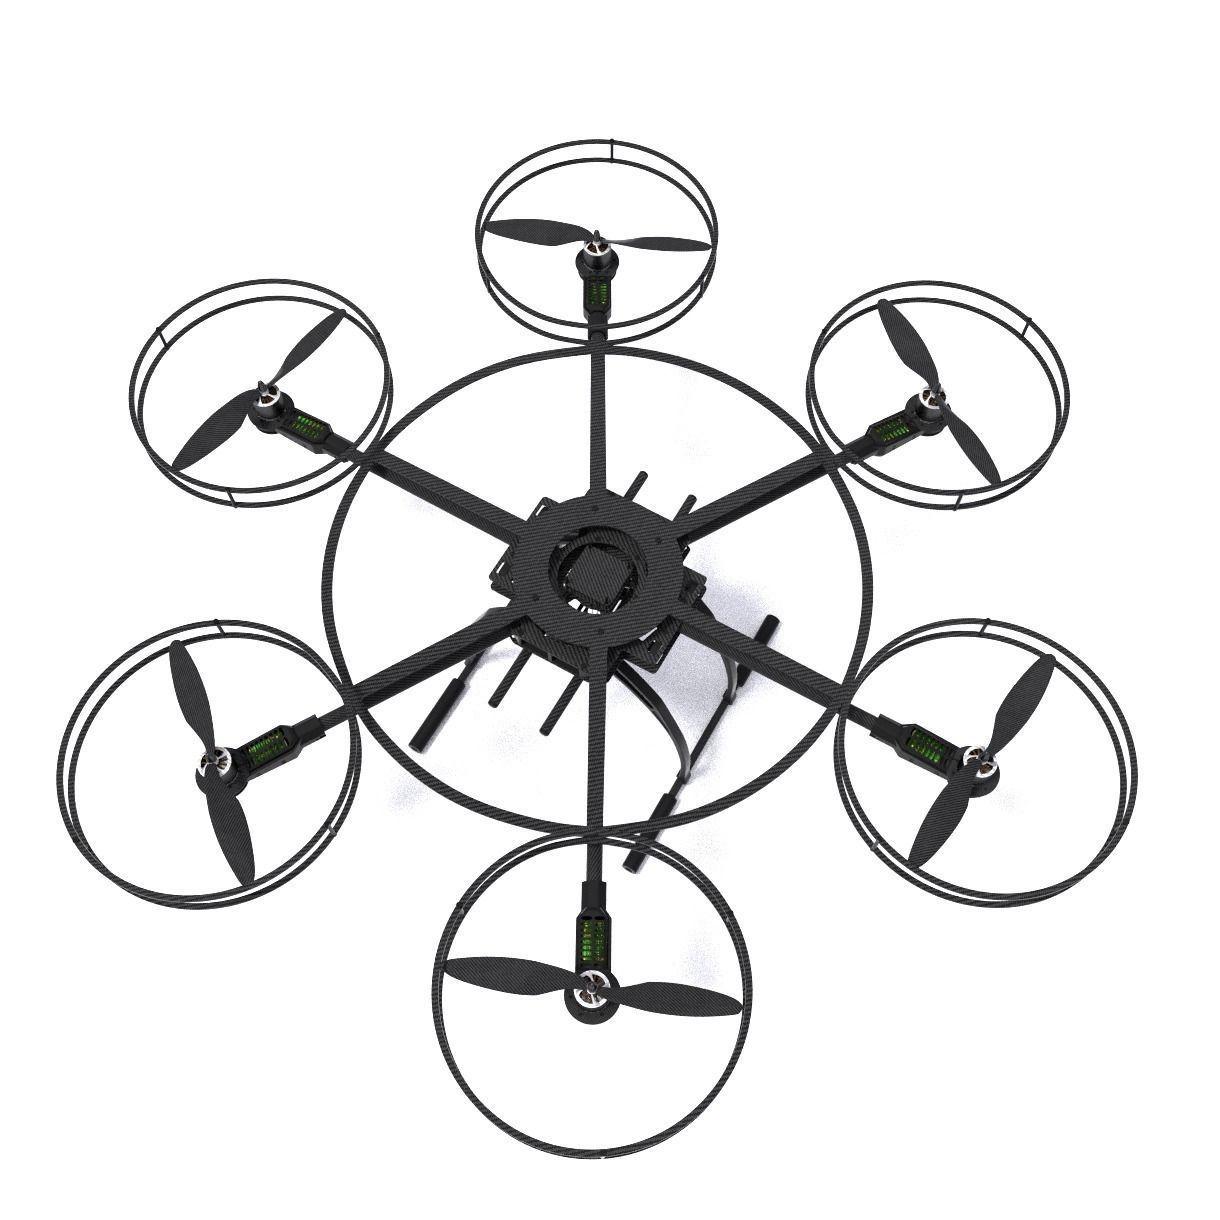 hexacopter drone | 3D model